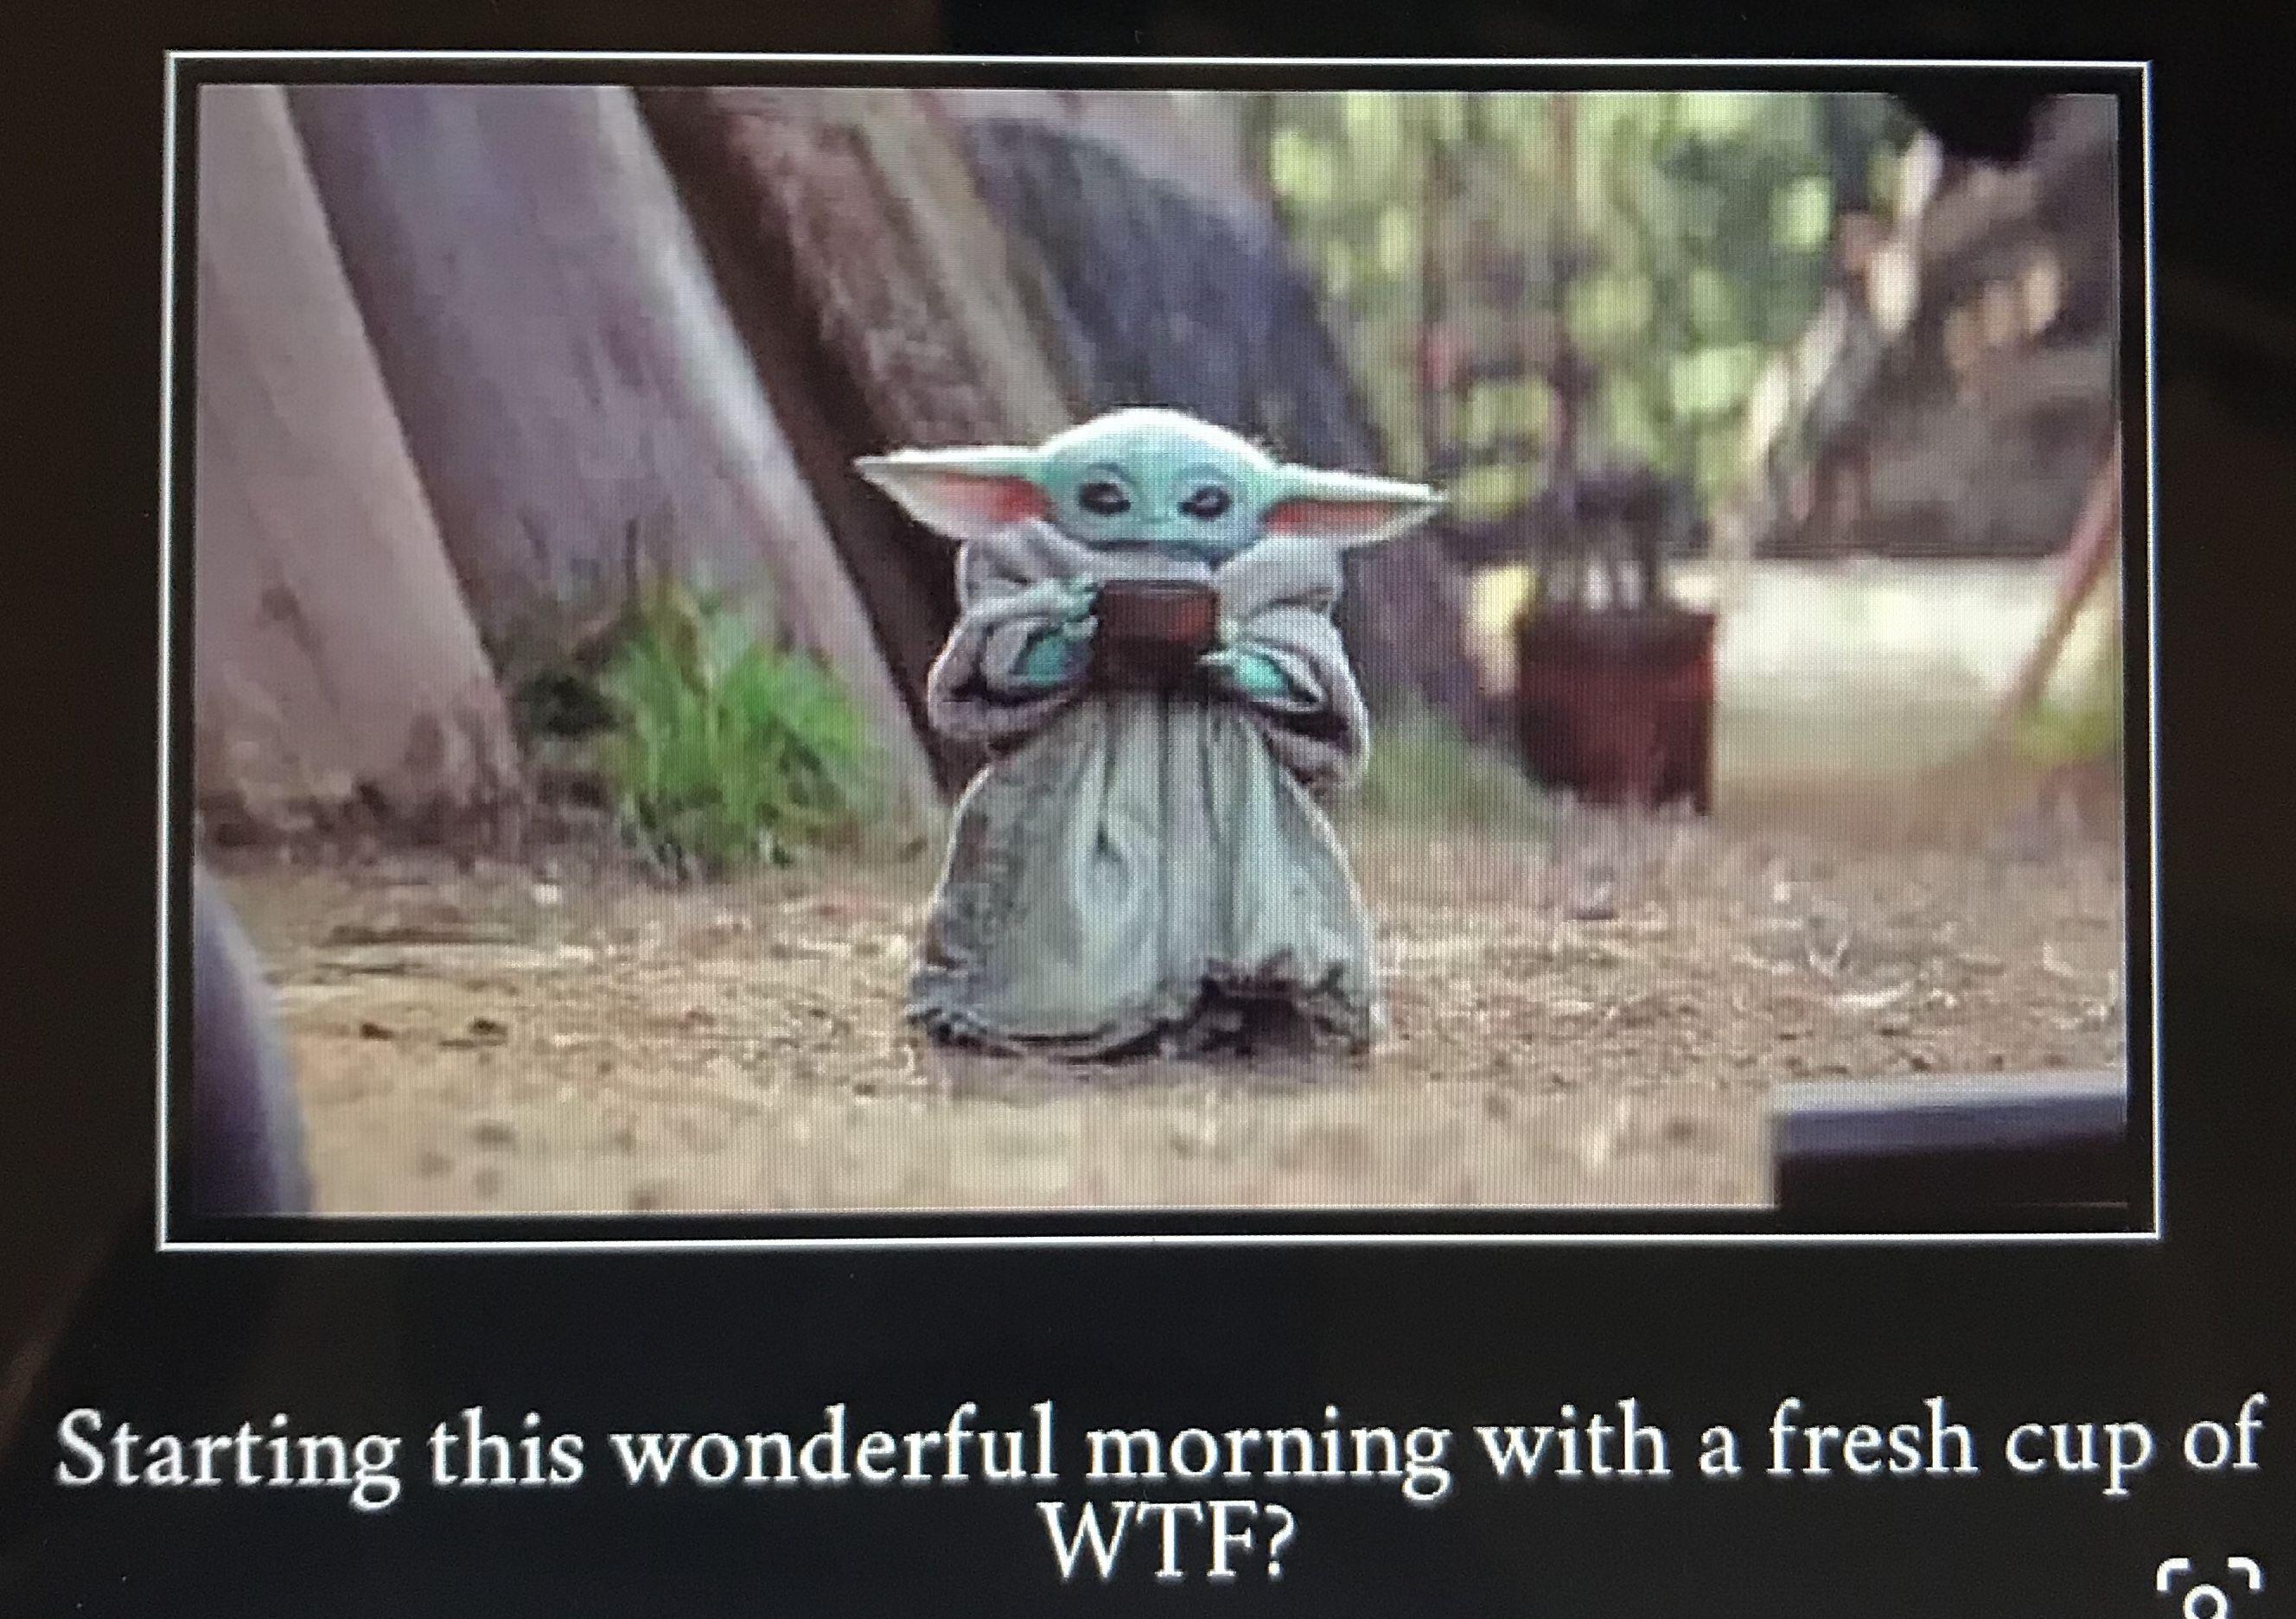 Baby Yoda Morning Cup Wtf Yoda Meme Animal Memes Funny Animal Memes